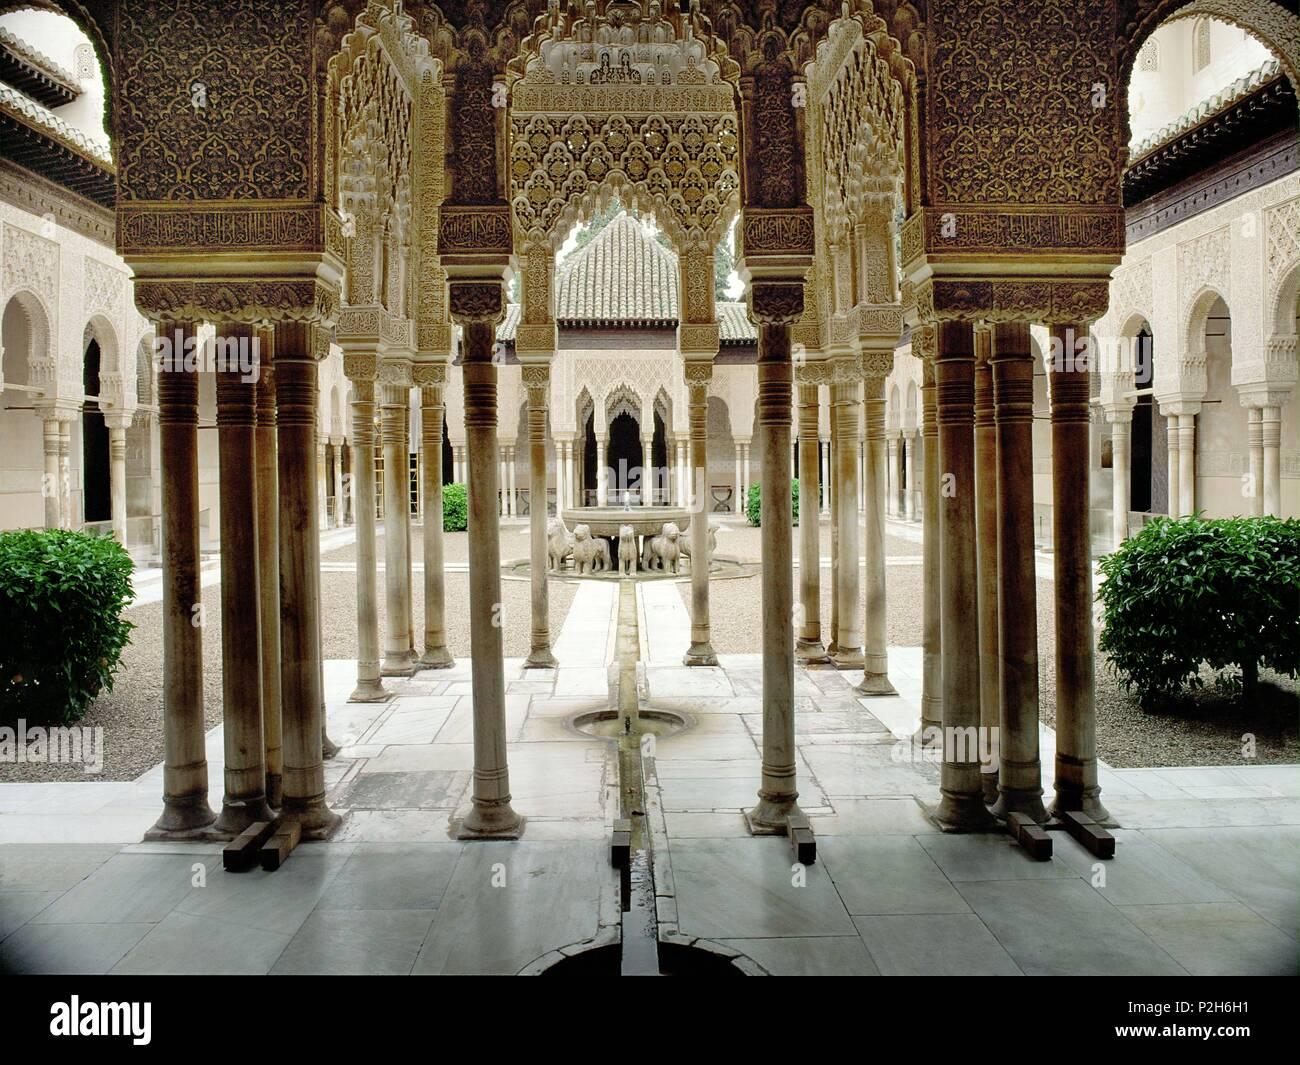 Patio De Los Leones La Alhambra Granada Espana Stock Photo